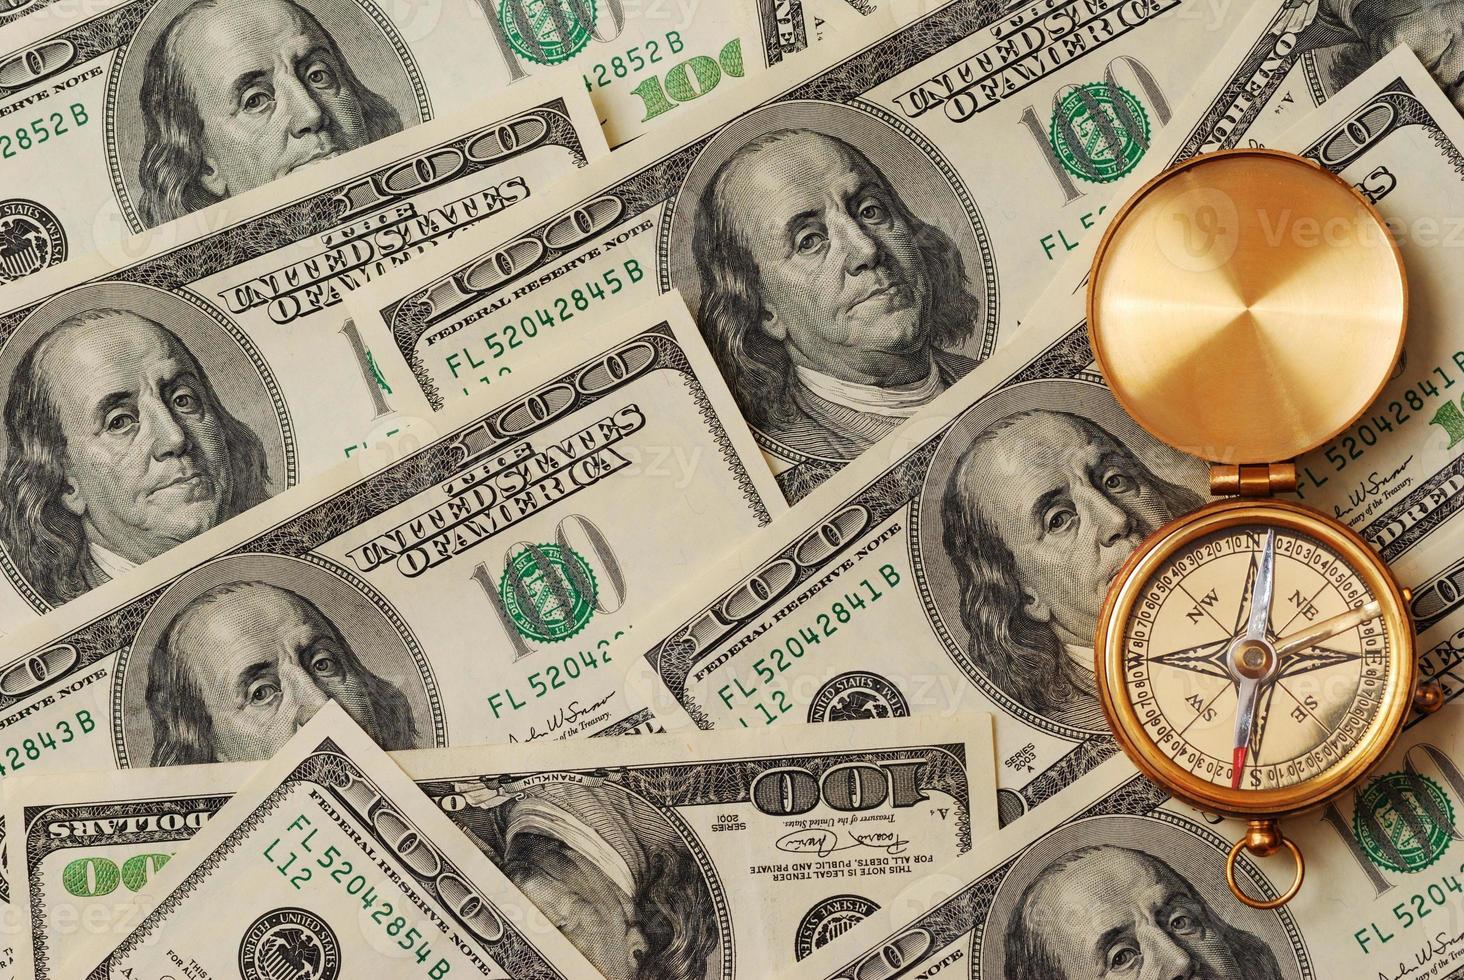 Antique compass over money photo